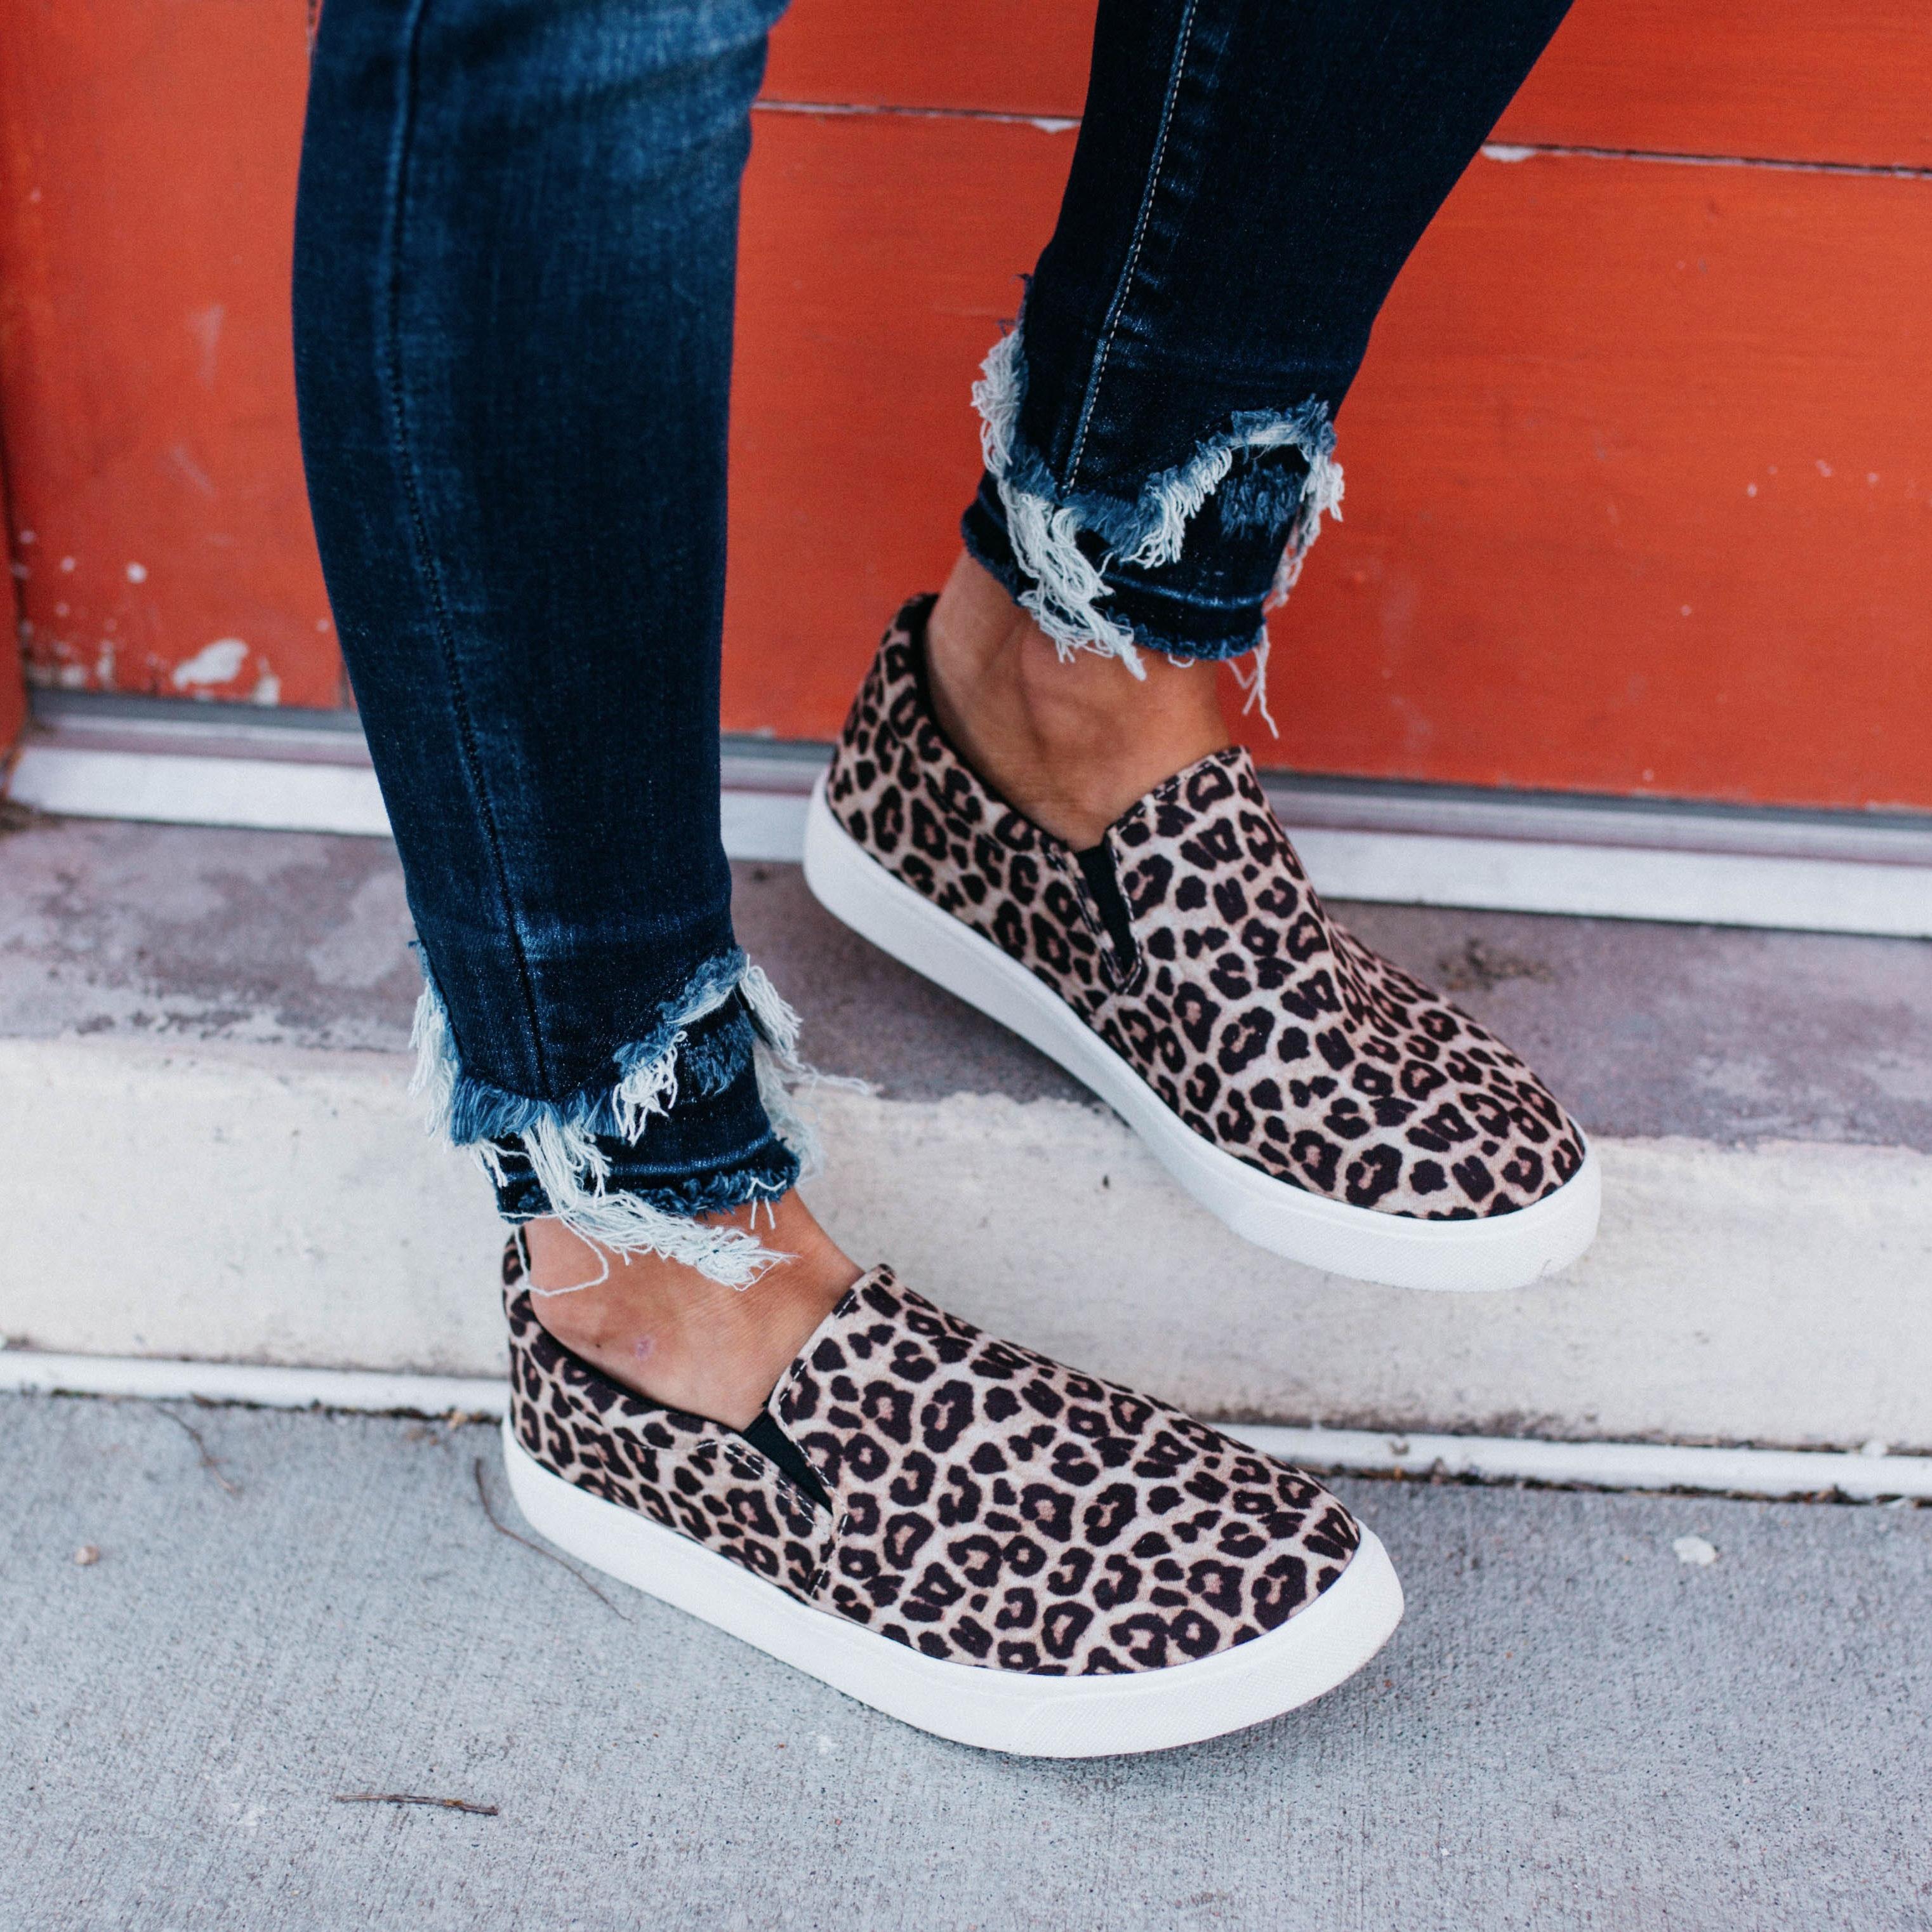 Women's Soda Brand Cheetah Slip-on Sneaker Shoe